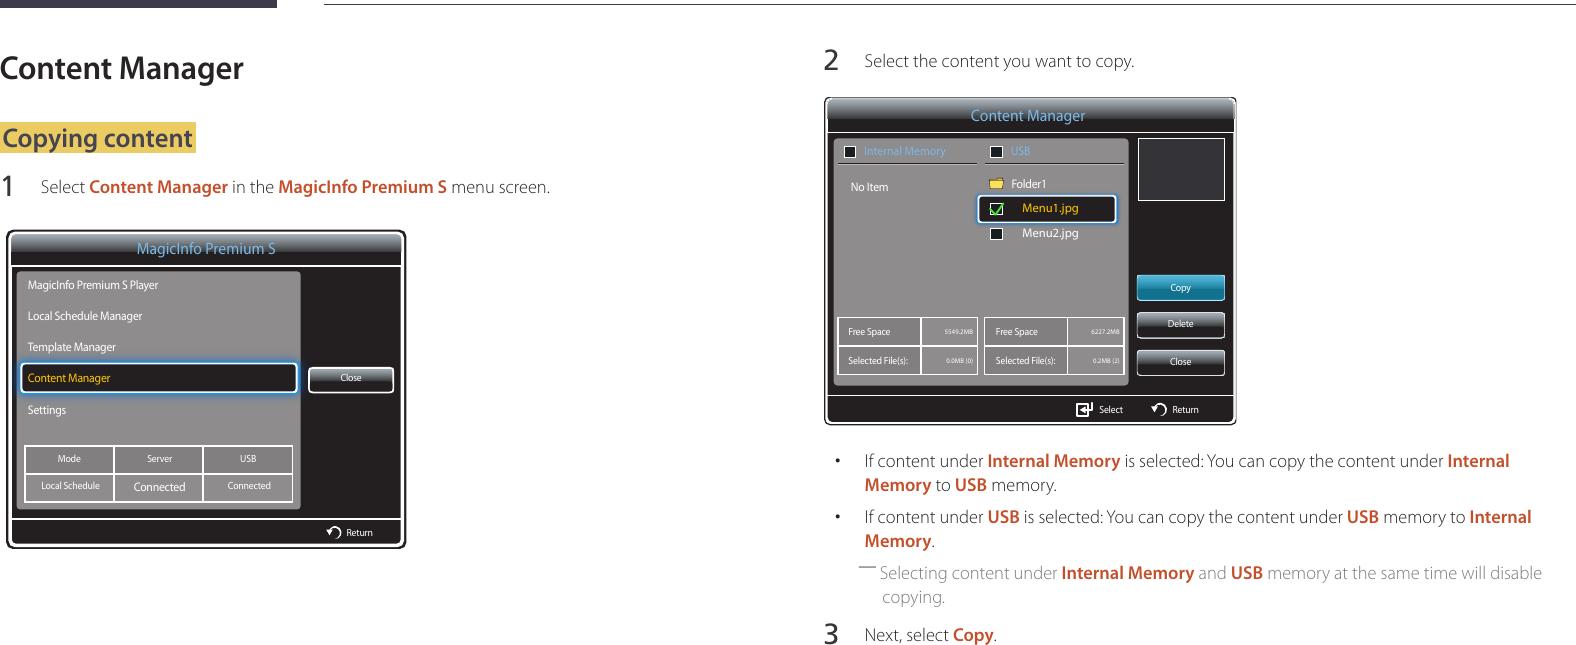 Samsung Bn46 00098R 04 Users Manual